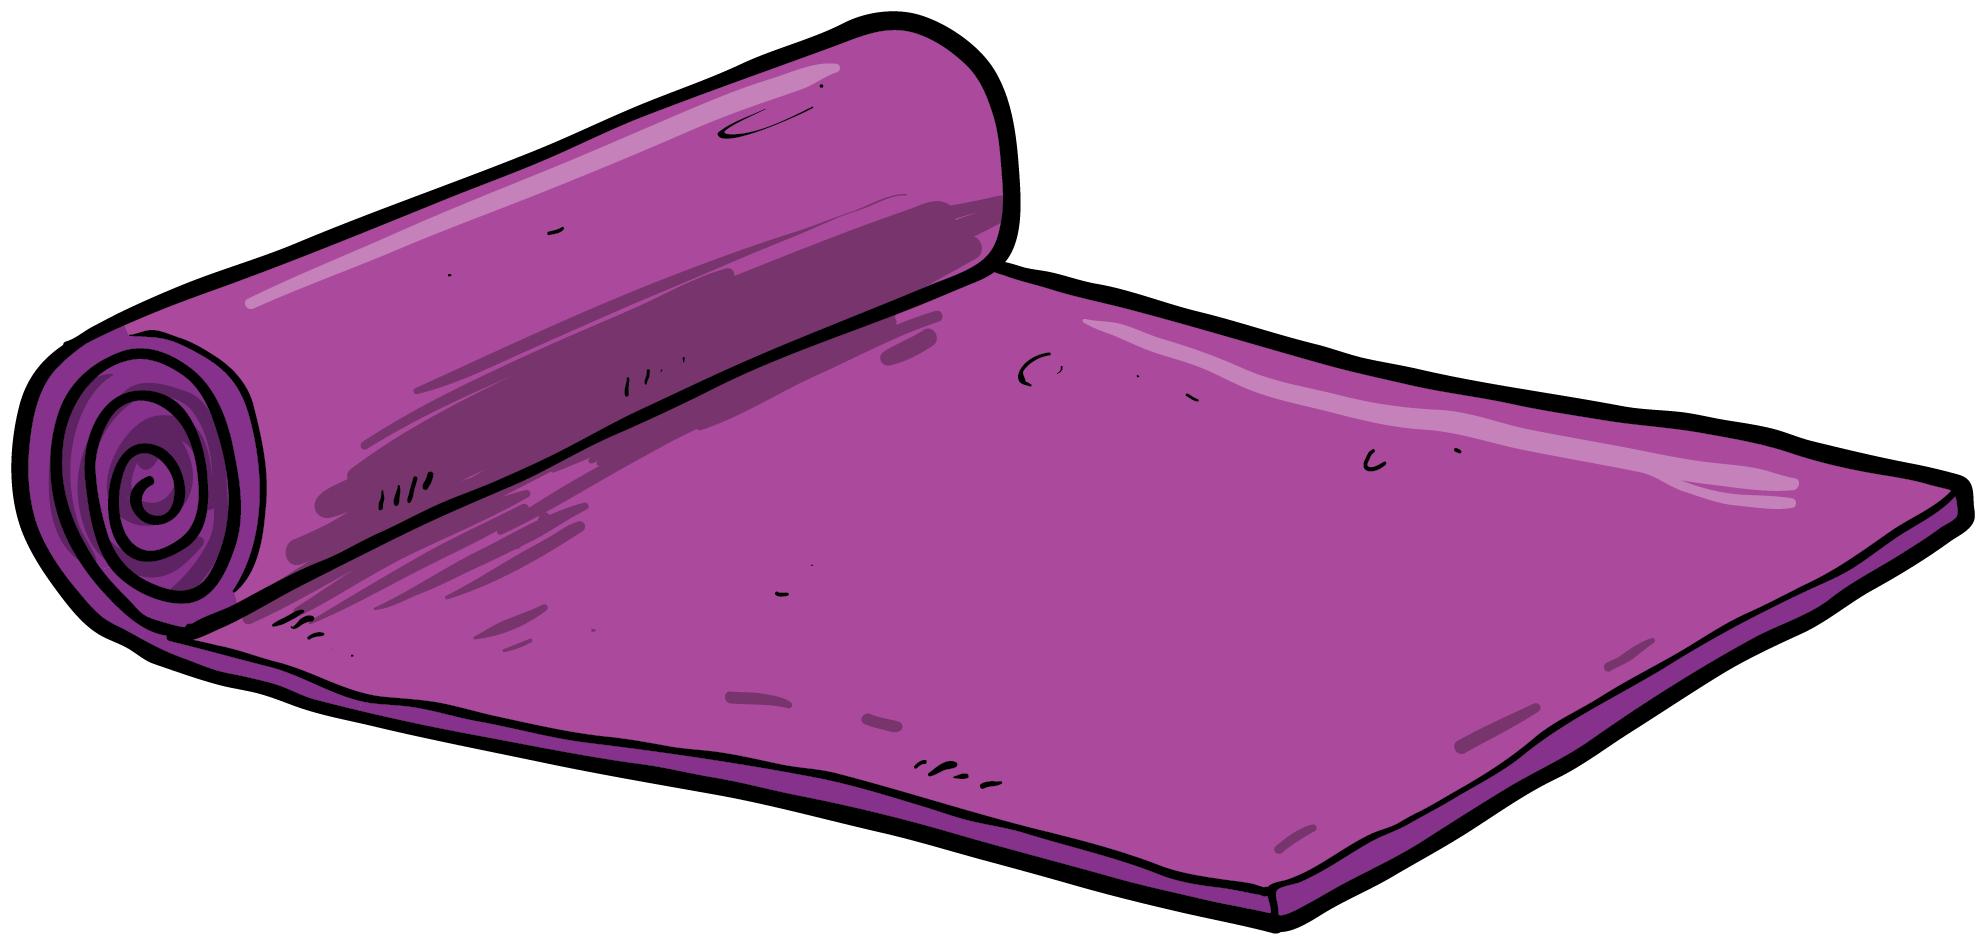 Transparent Yoga Mat Clipart Yoga Mat Clipart Png Download Full Size Clipart 5210683 Pinclipart